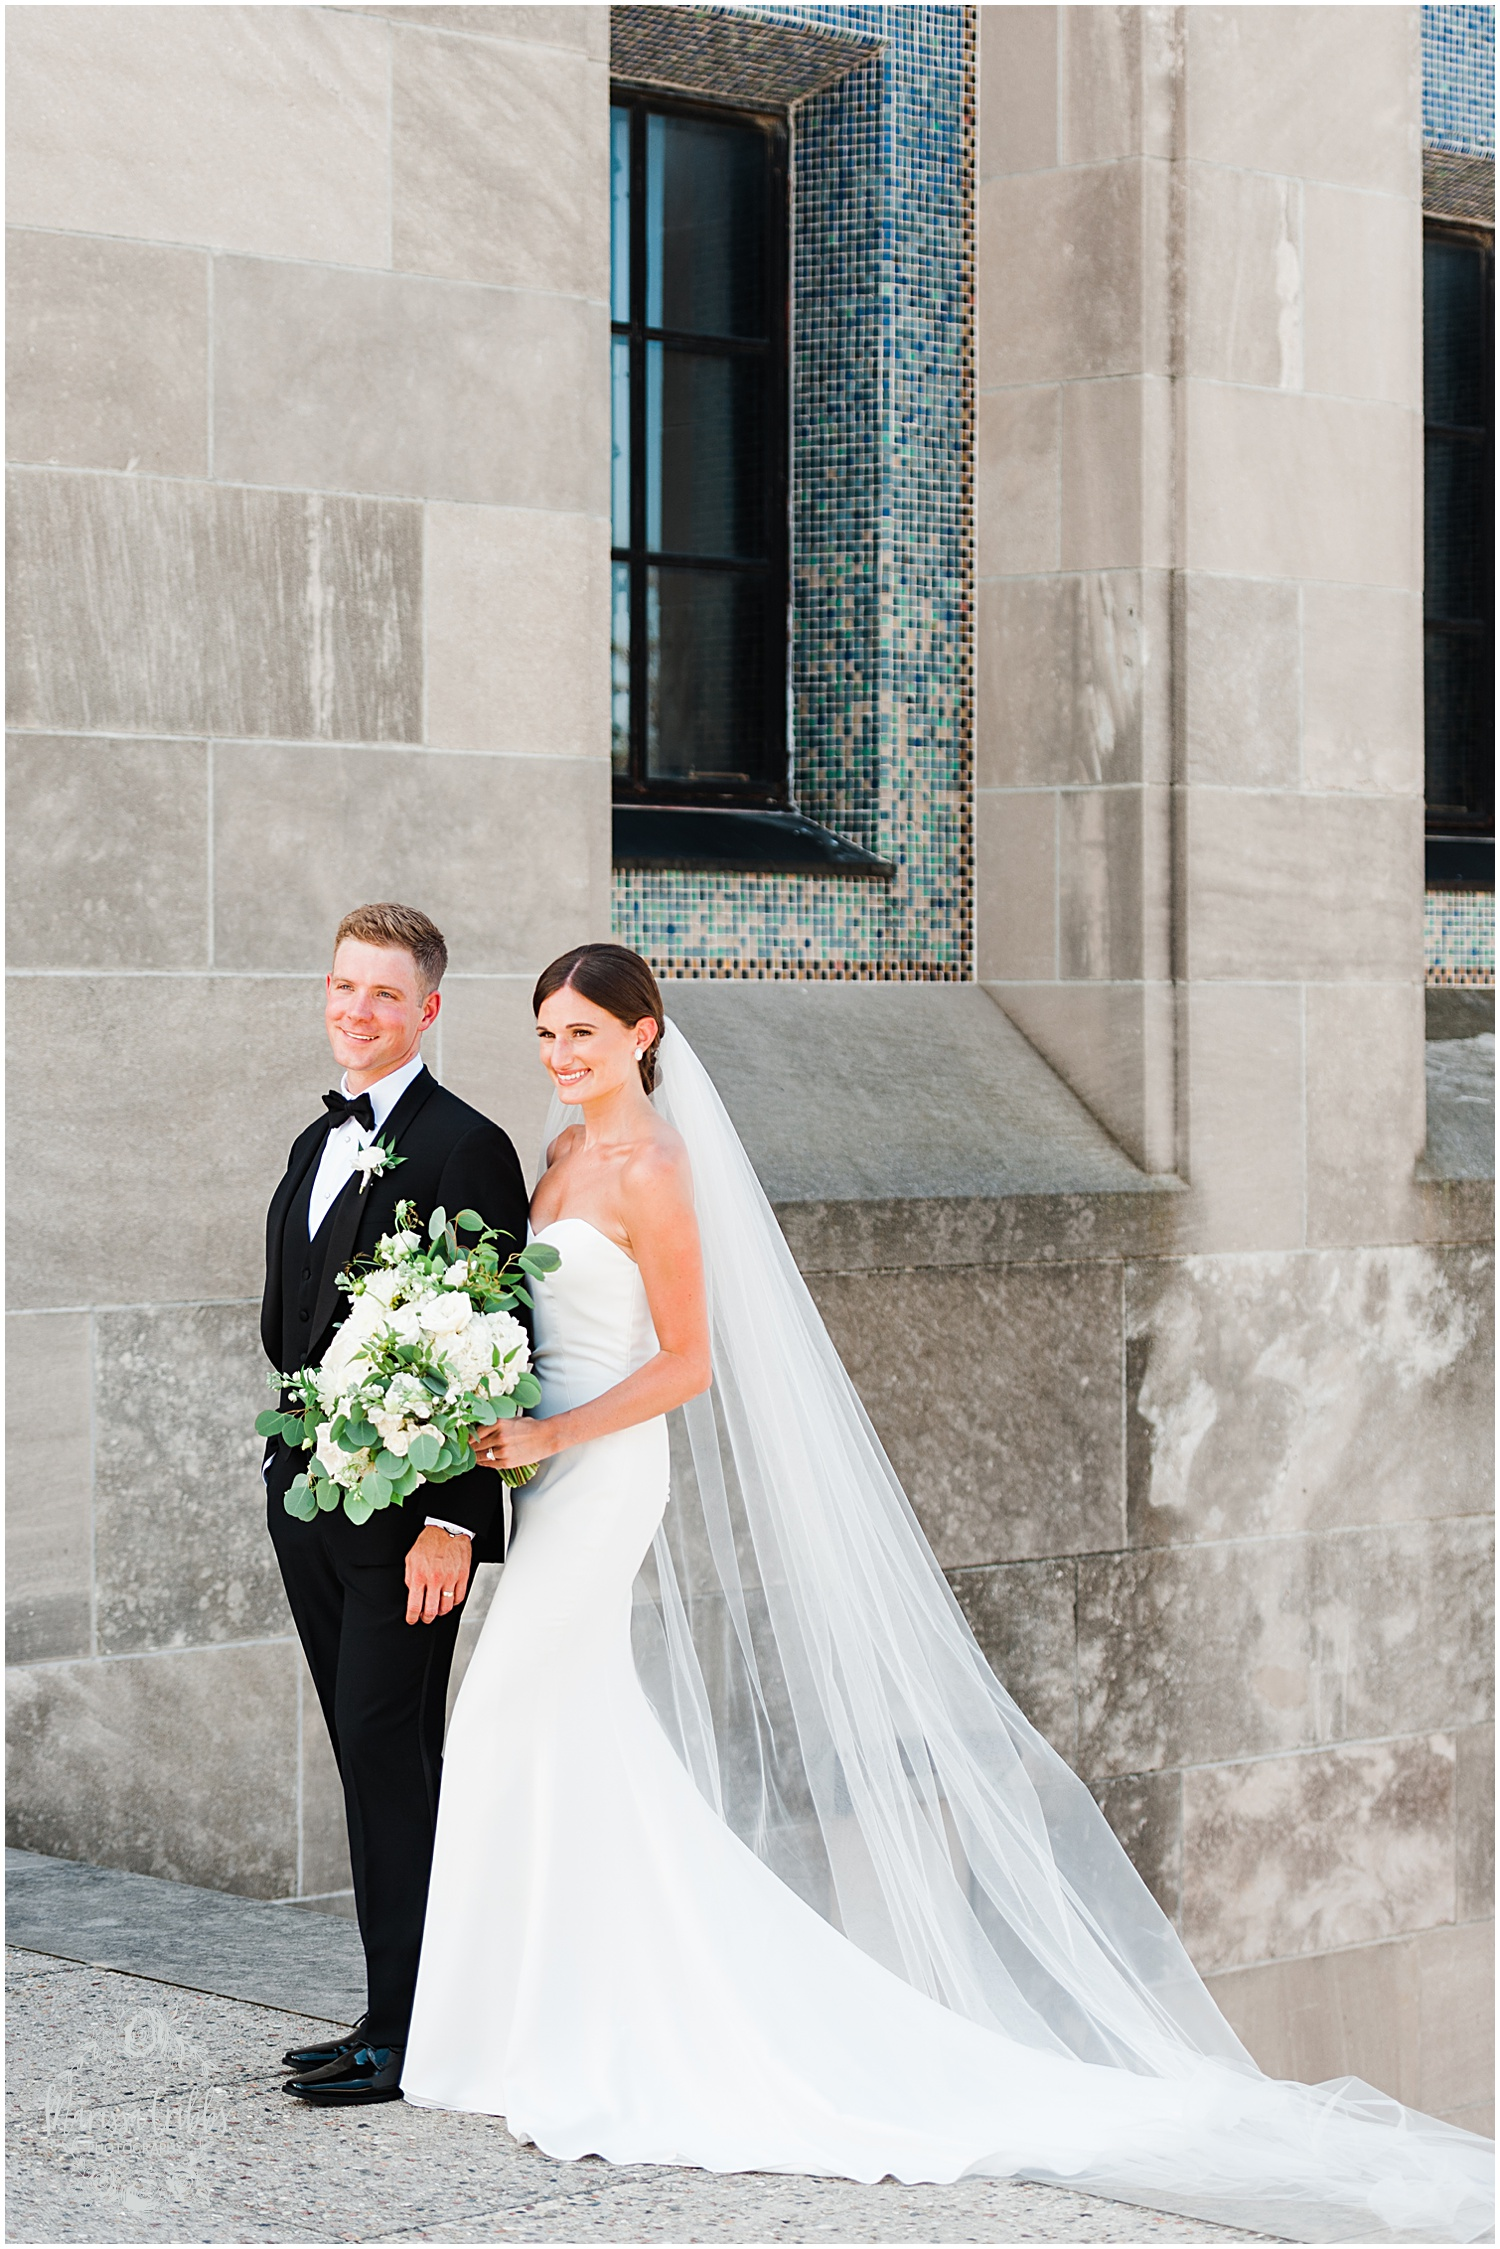 JOANNE & GEORGE MARRIED BLOG | MARISSA CRIBBS PHOTOGRAPHY | THE ABBOTT | KANSAS CITY WEDDING PHOTOS_9054.jpg